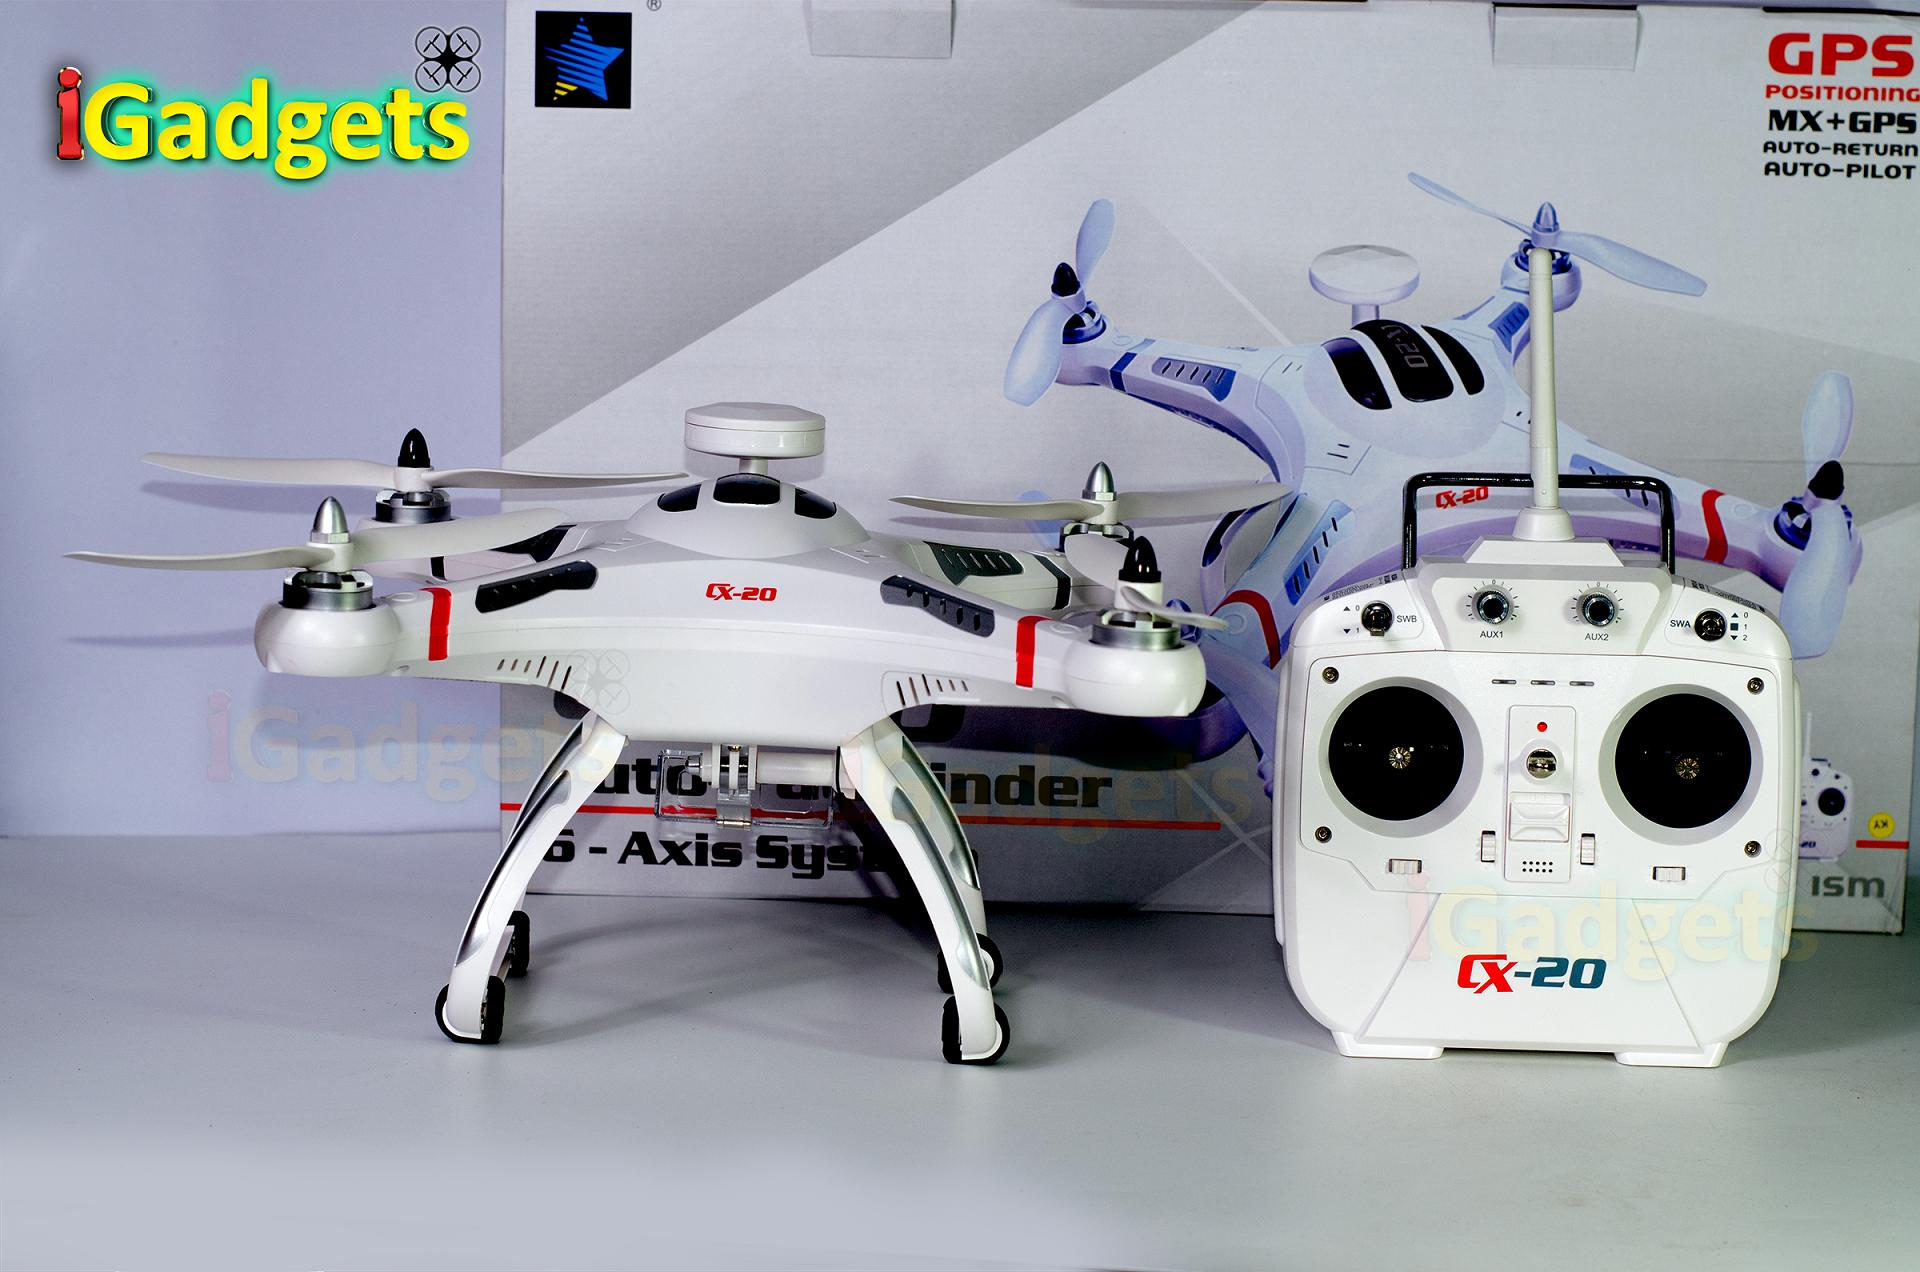 Cheerson CX-20 GPS Drone Auto Pilot , Return to Home (มีระบบบินอัตโนมัติ และสามารถบินกลับบ้านเองได้)